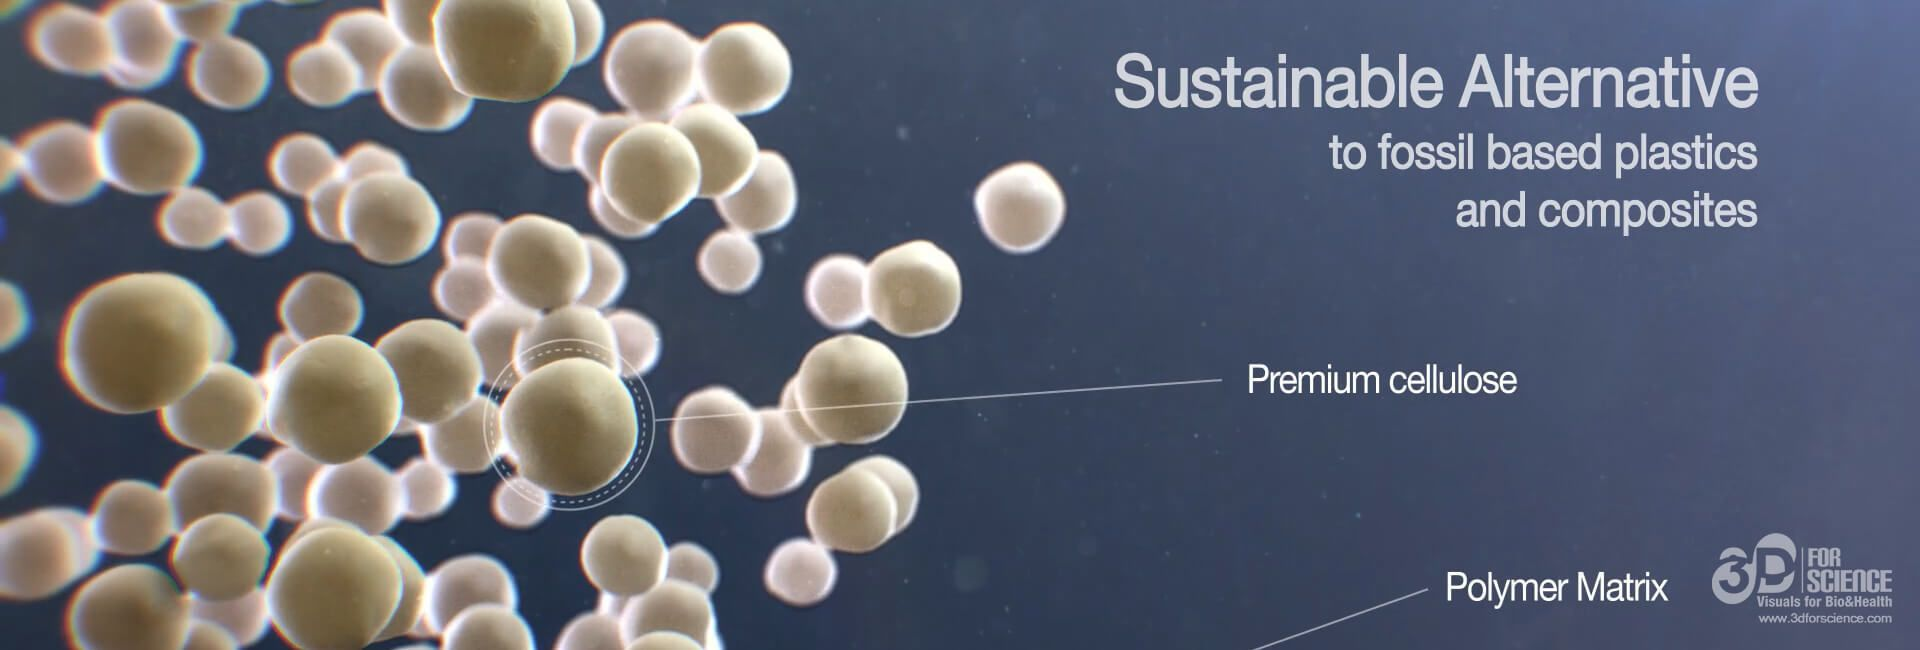 graphic of sustainable alternative of sappi symbio